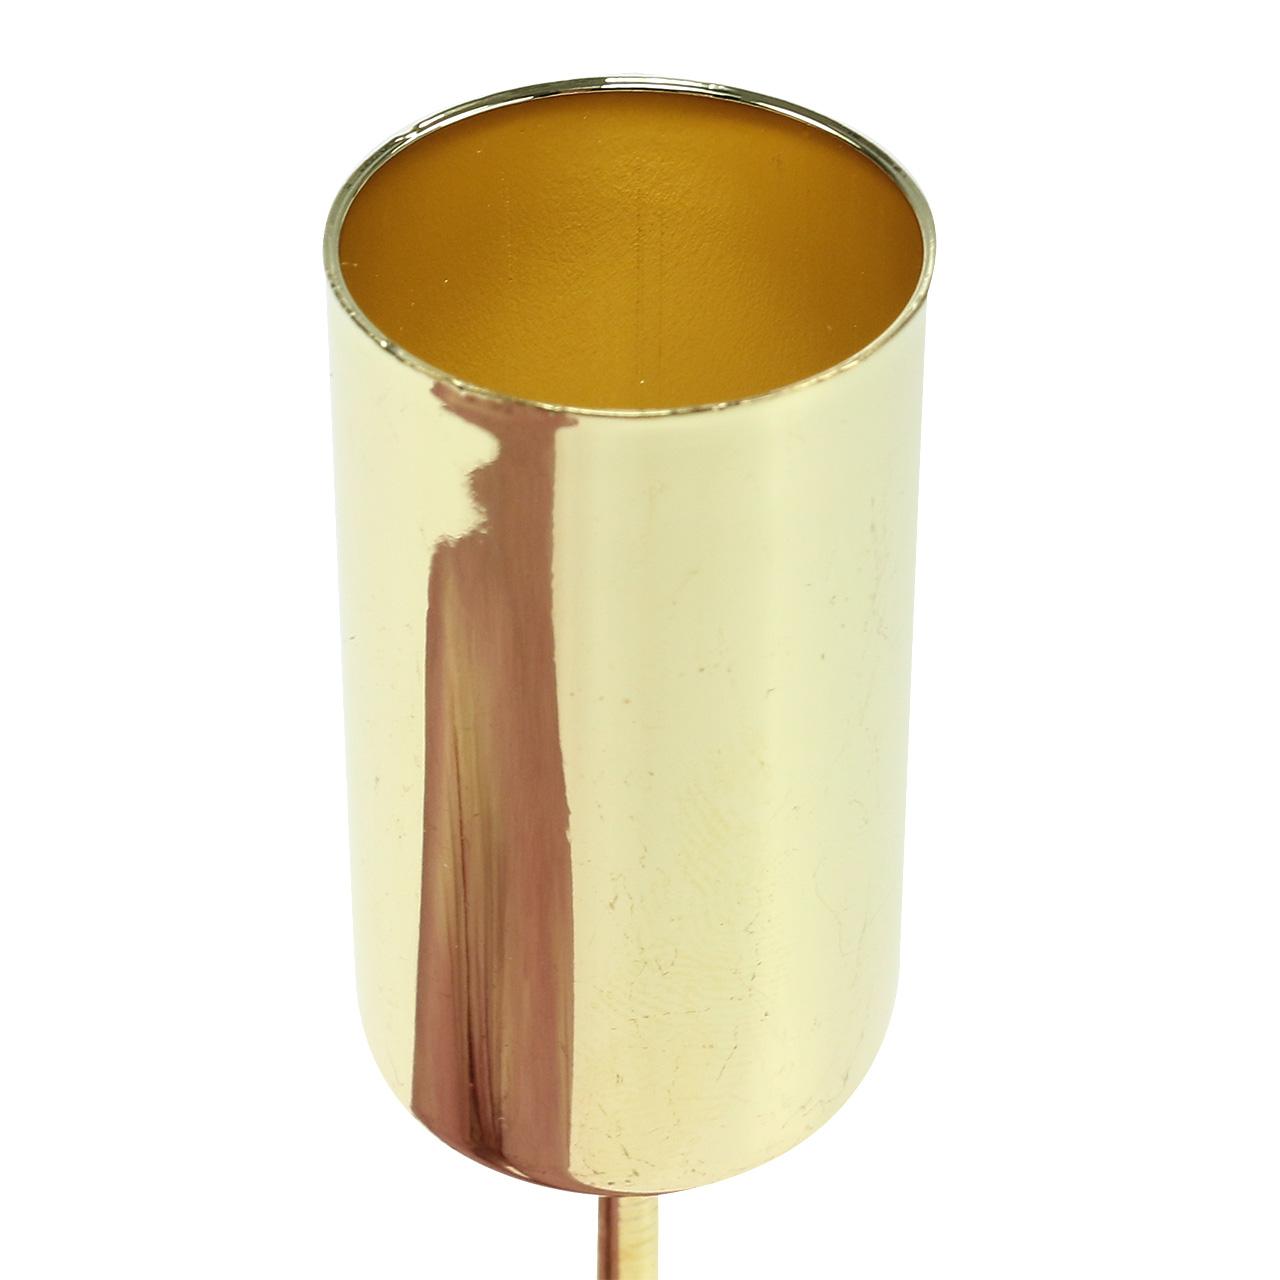 kerzenhalter gold f r stabkerzen 2 2cm 4st preiswert. Black Bedroom Furniture Sets. Home Design Ideas